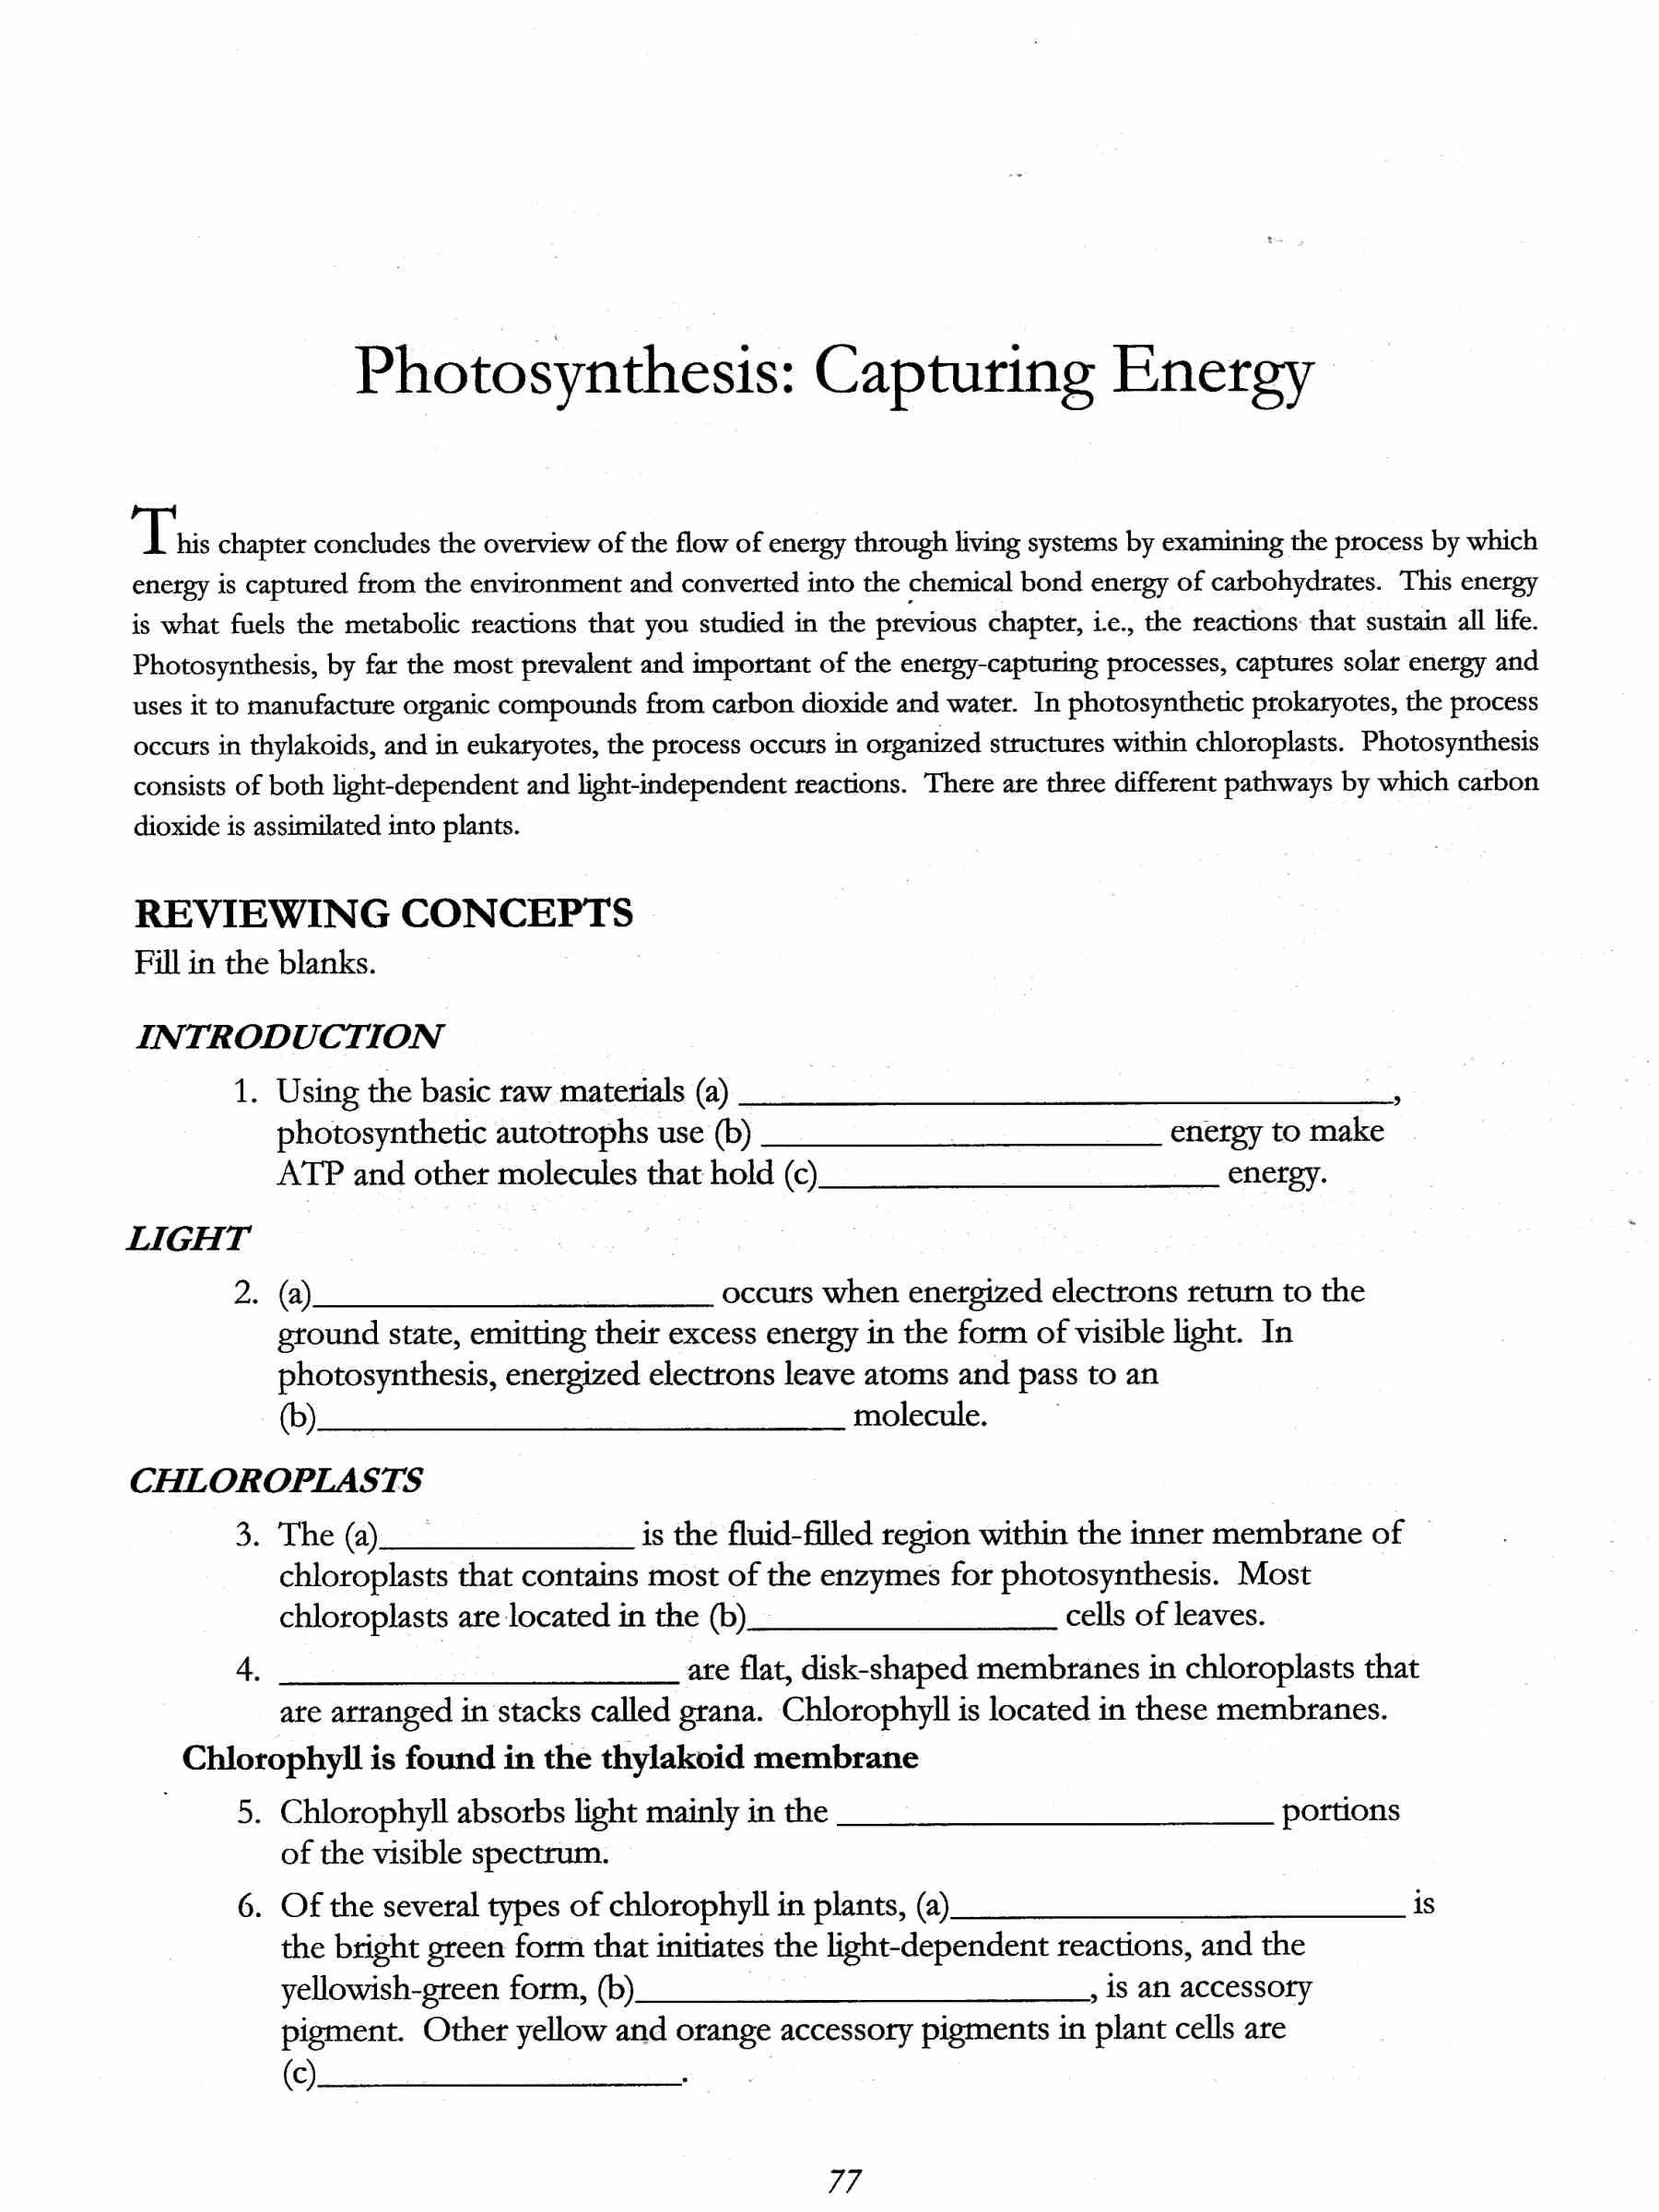 Worksheets Photosynthesis Worksheets photosynthesis 1 jpg hcc learning web jpg